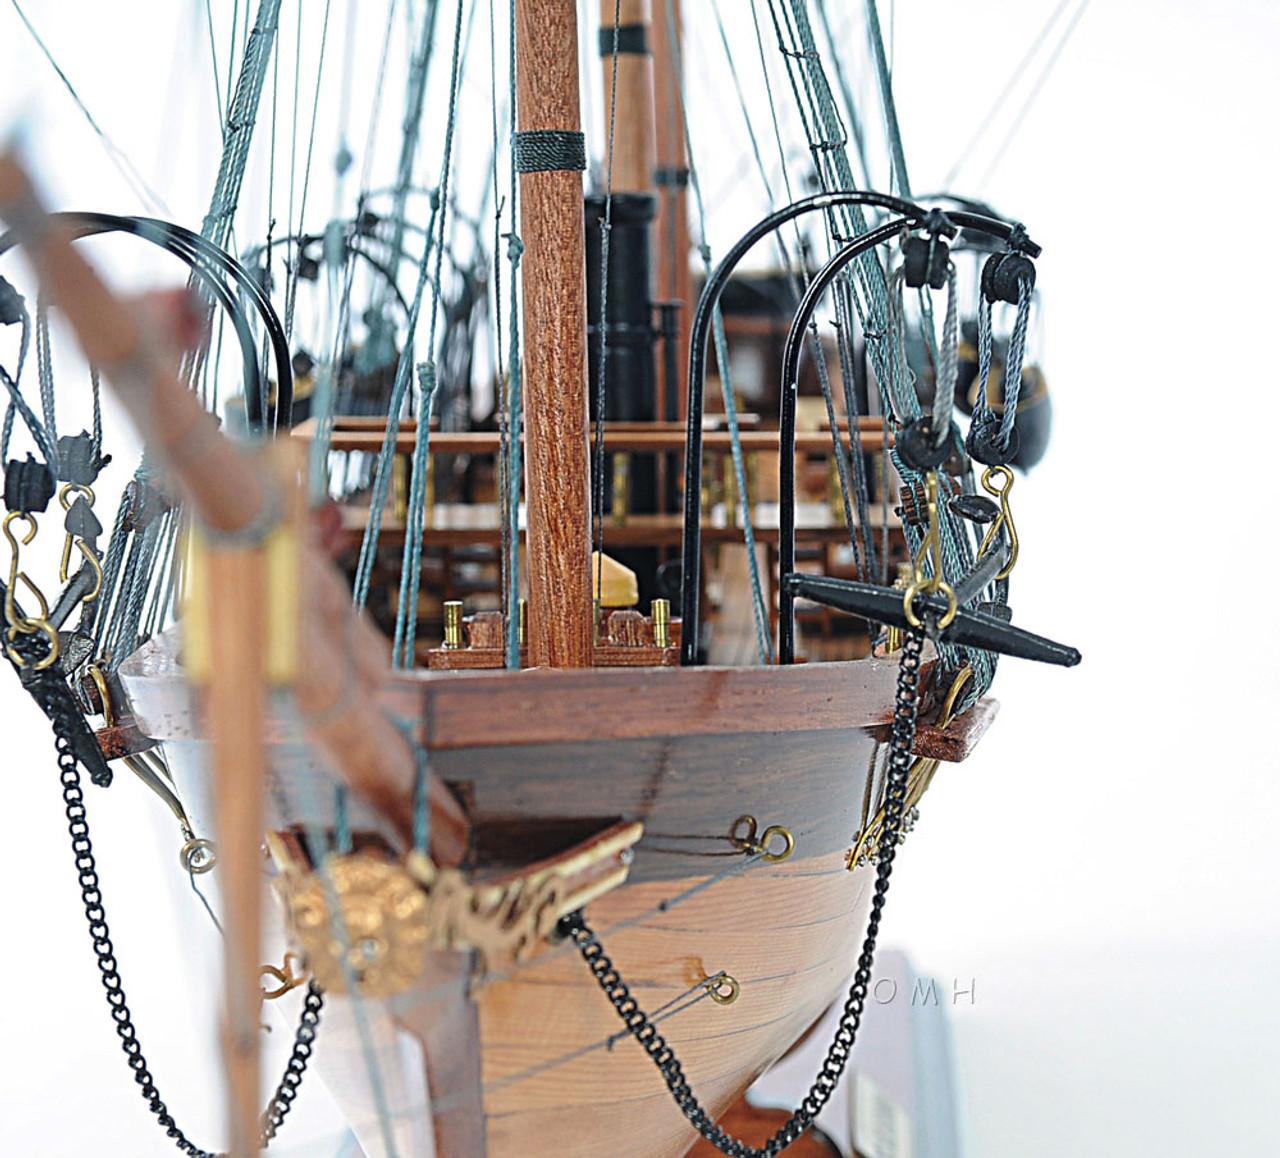 CSS Alabama Steam Ship Model Civil War Raider